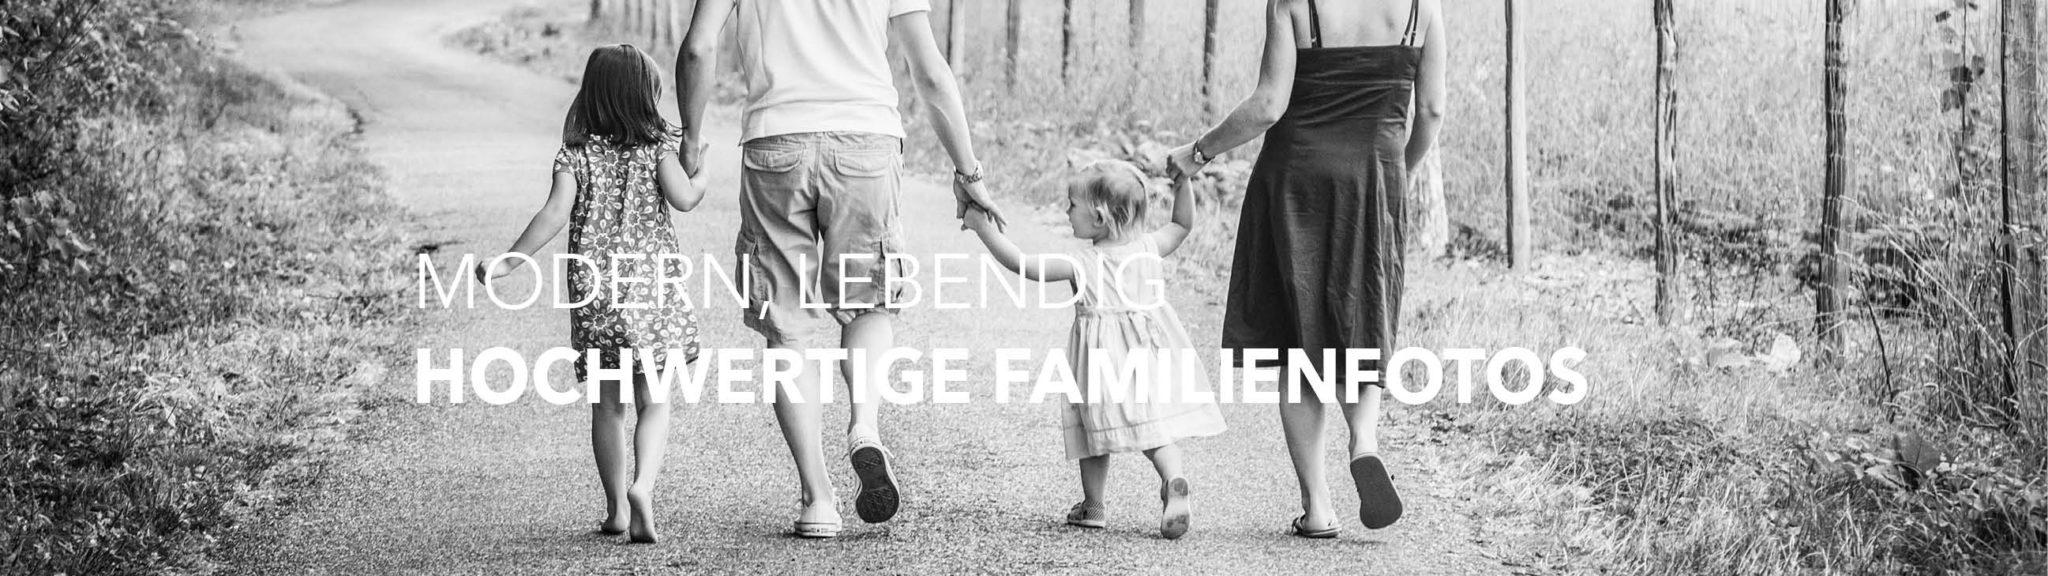 Familien Fotos Fotograf Mosbach